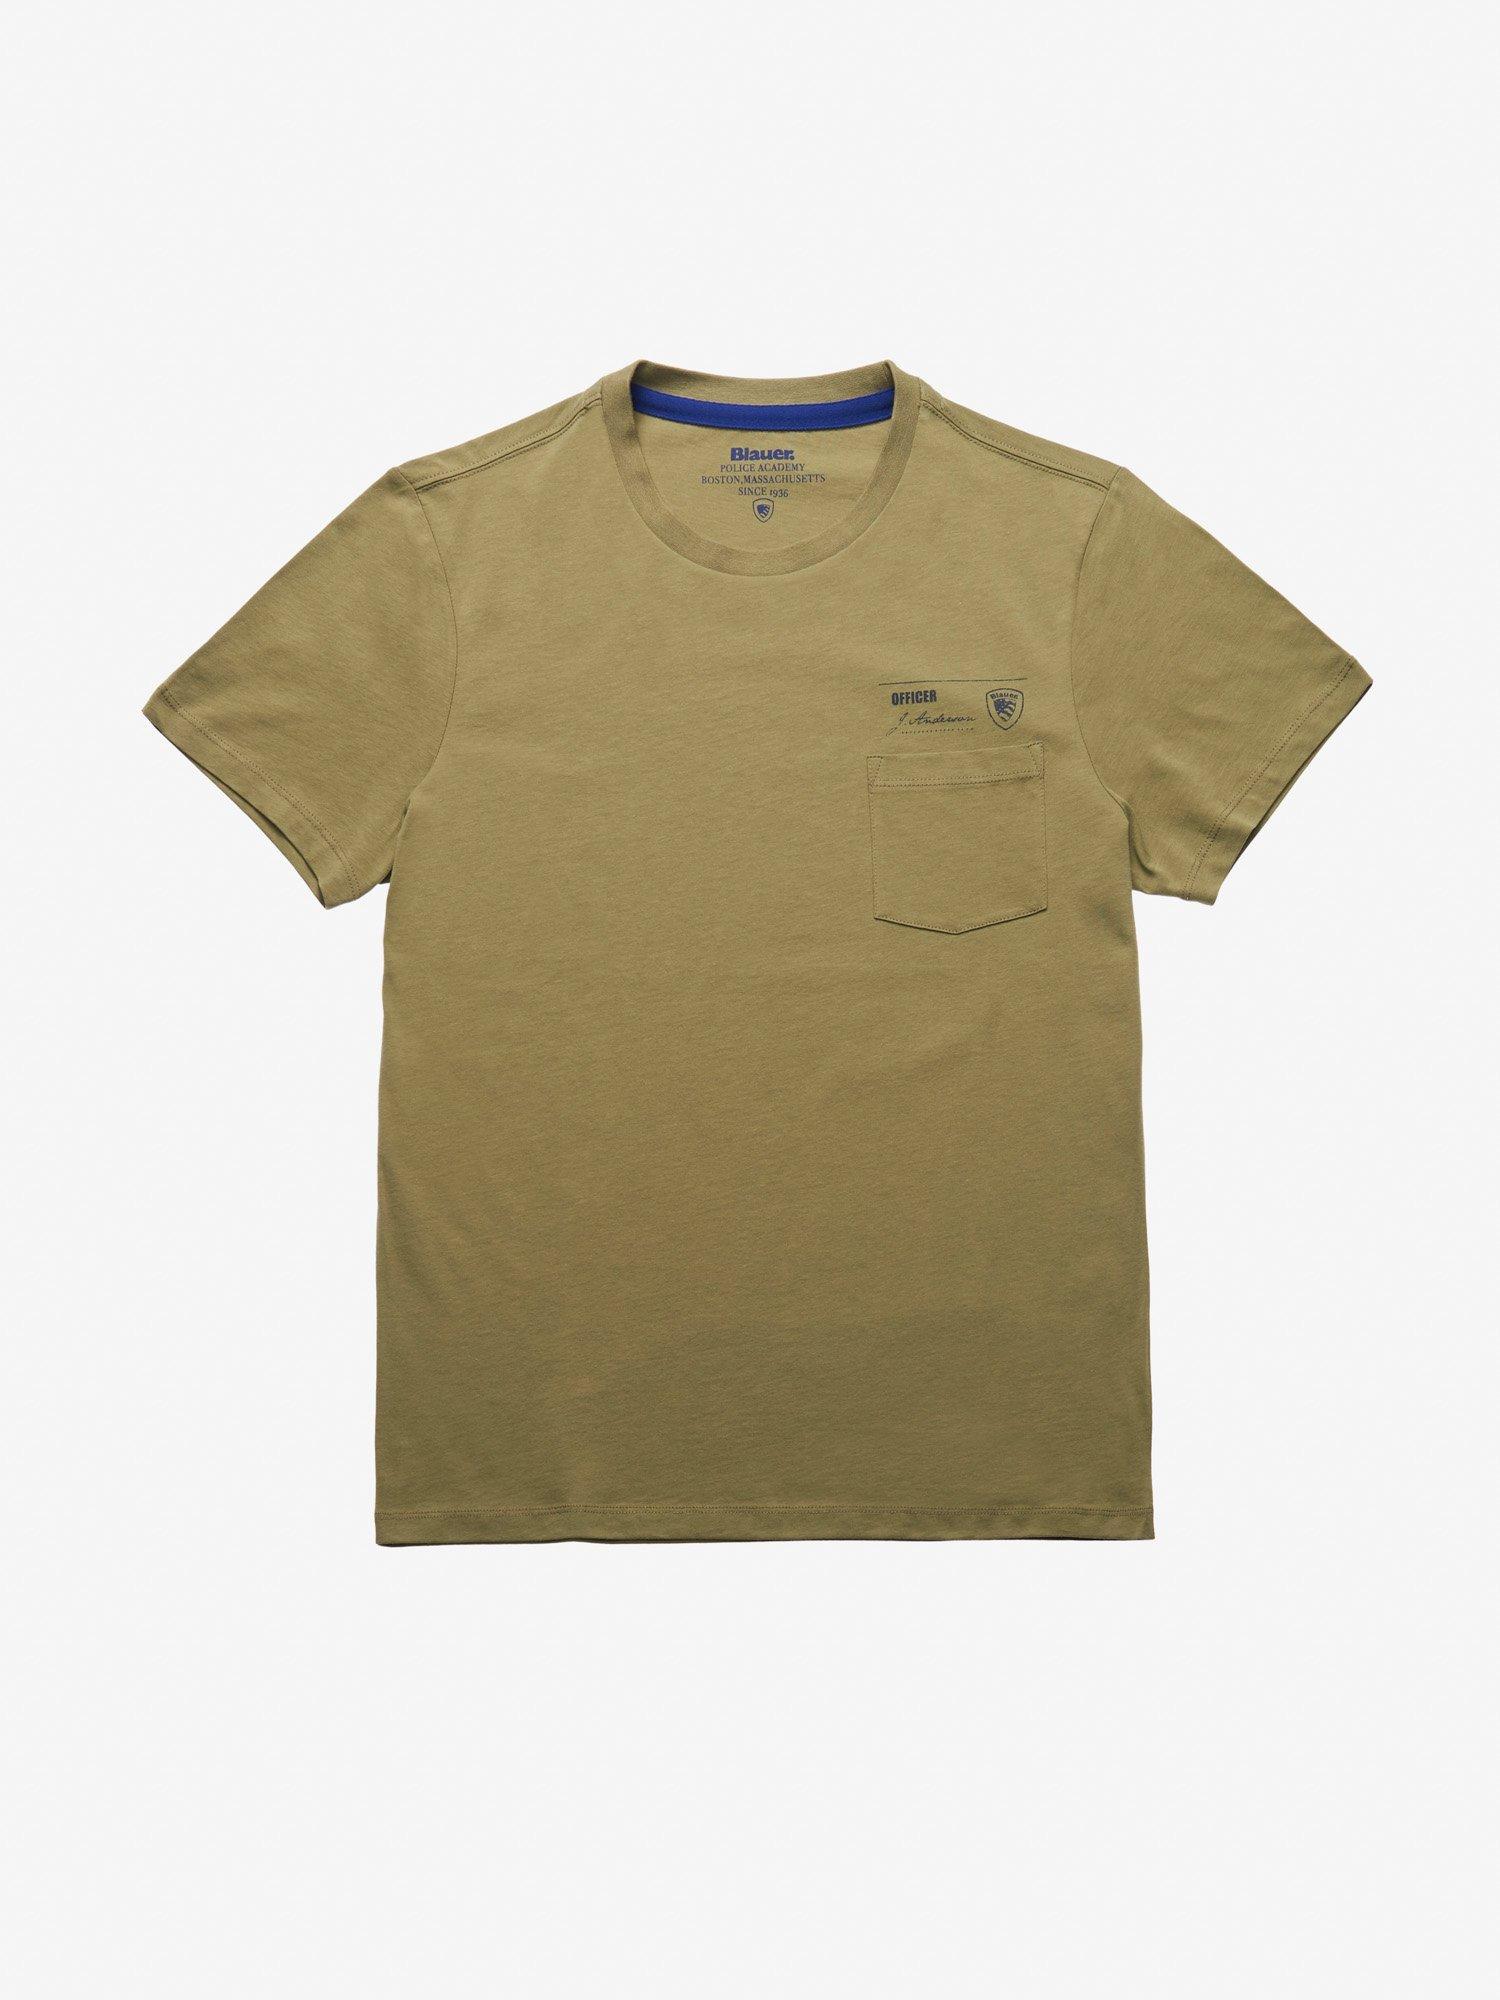 Blauer - MEN'S POCKET T-SHIRT - Dusty Green - Blauer